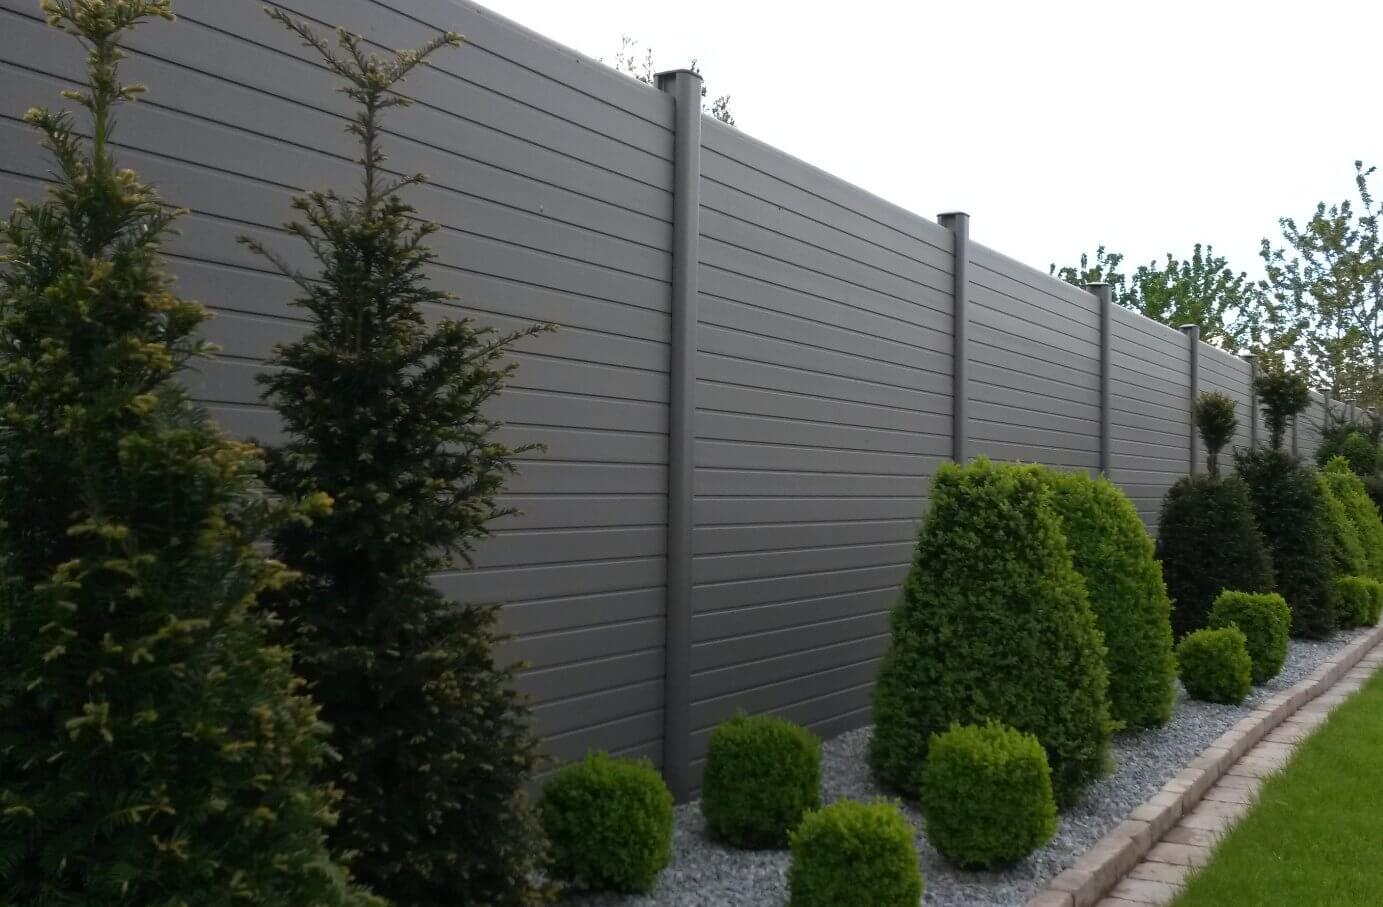 ECOfencing tuinscherm in de grijze kleur